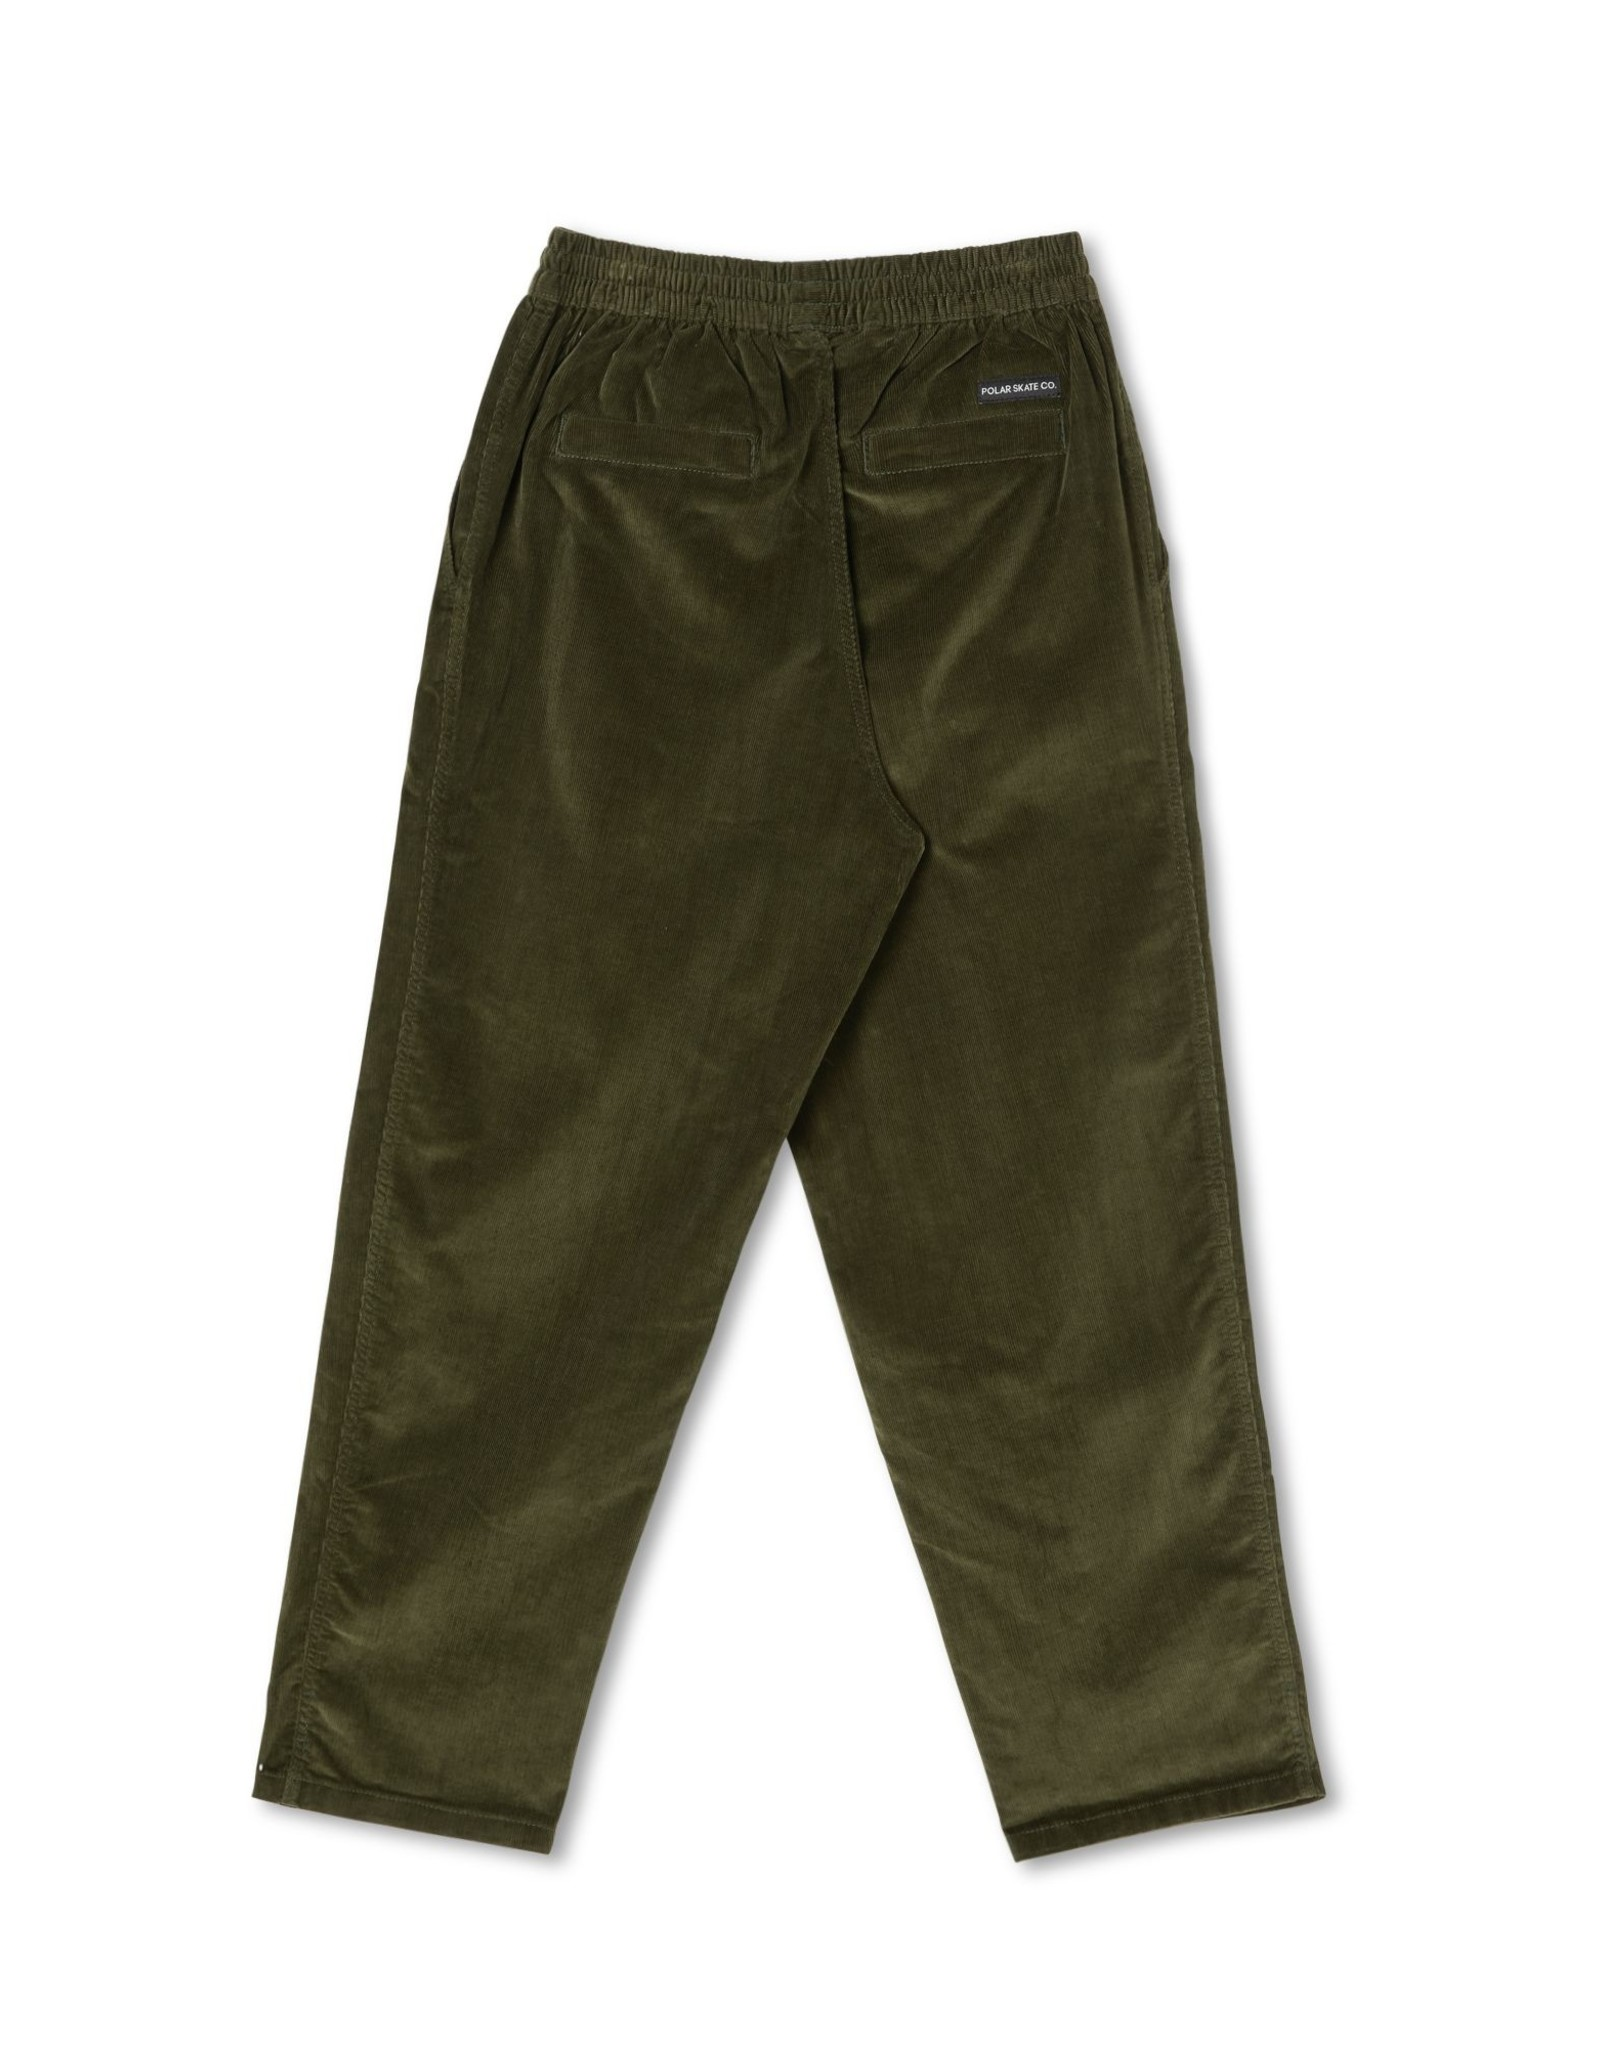 POLAR CORD SURF PANTS - UNIFORM GREEN